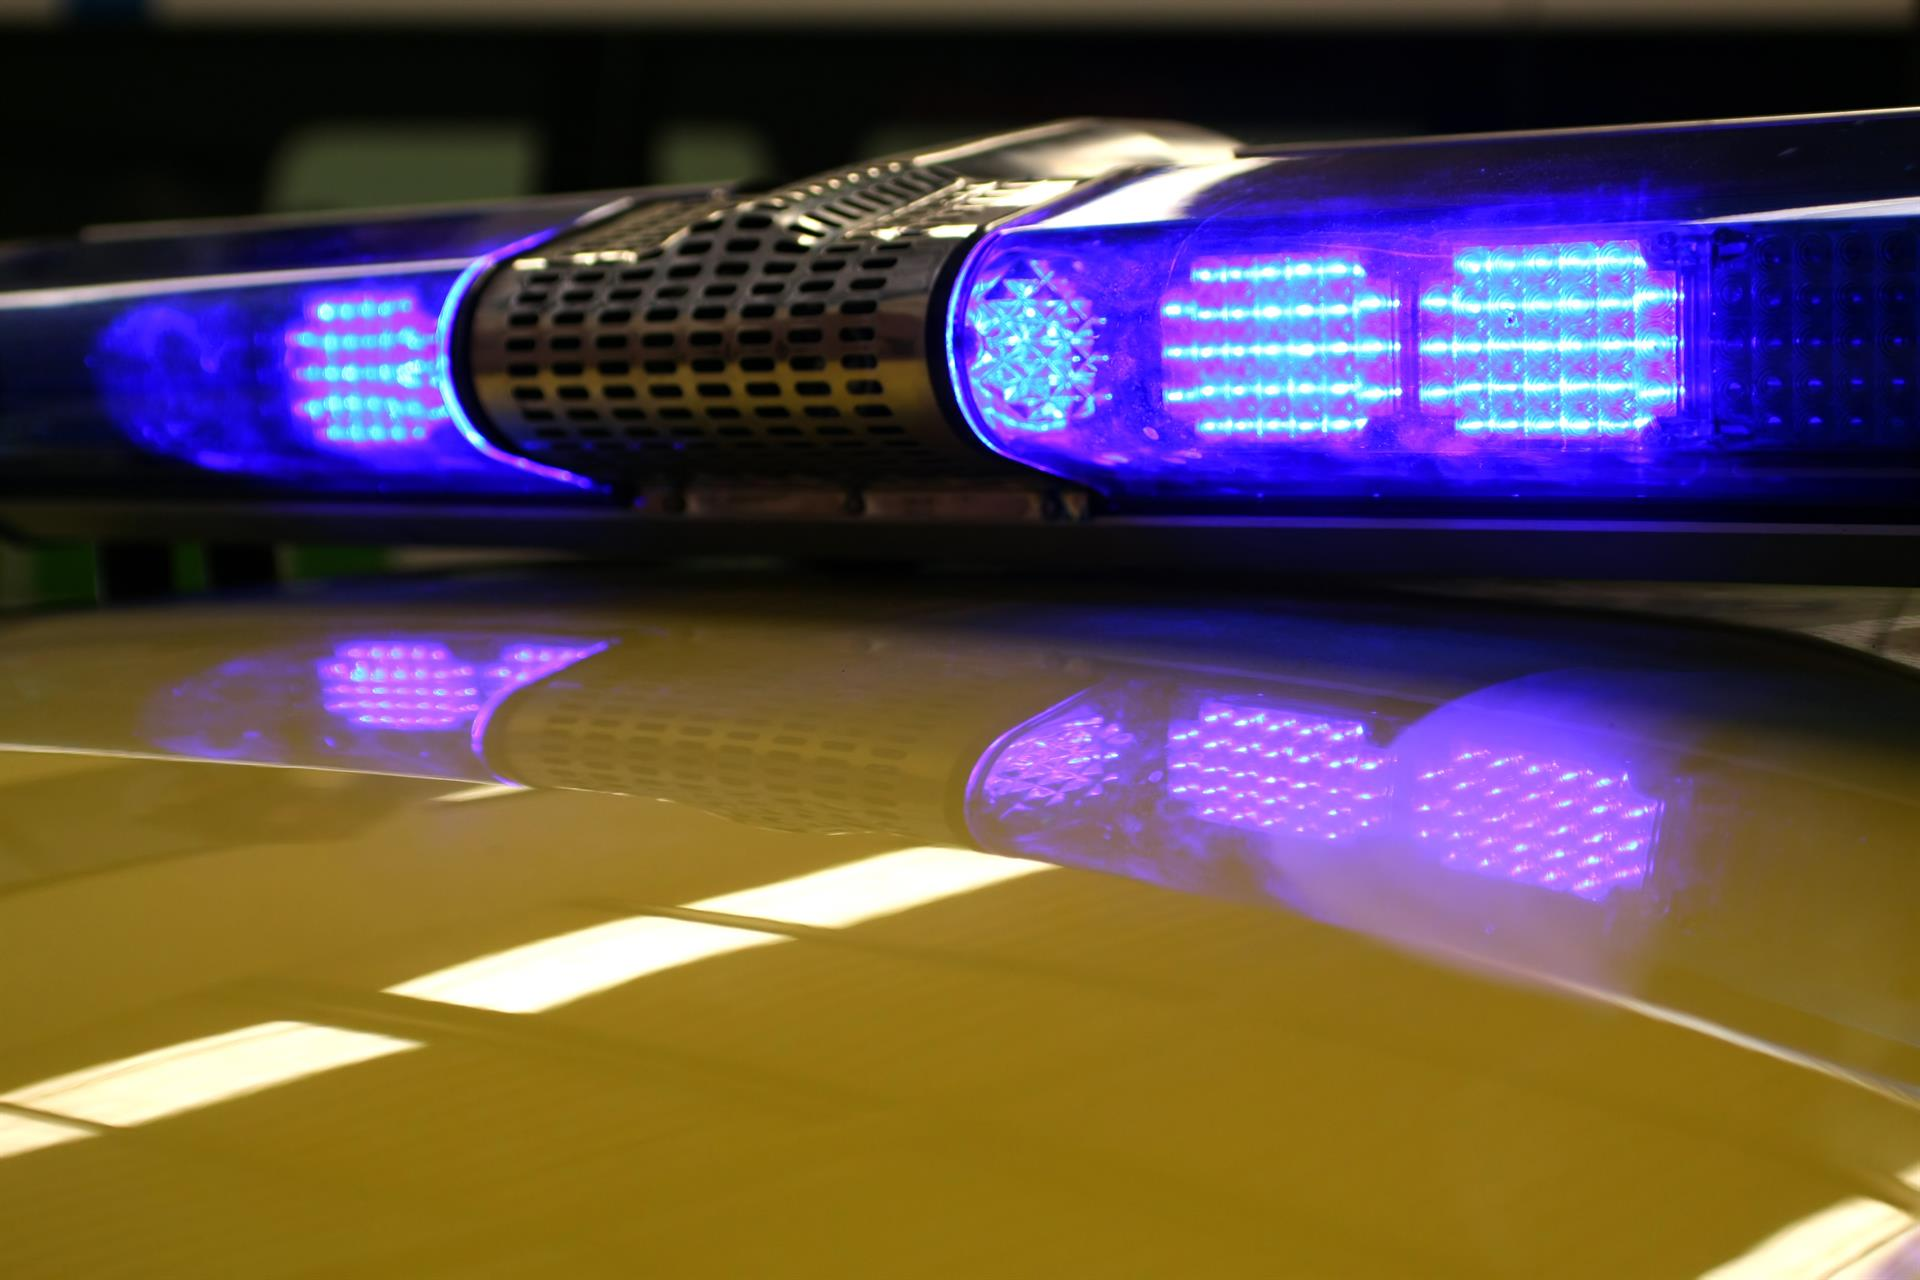 Rolna lima teška devet tona skliznula sa kamiona i smrskala auto usmrtivši vozača